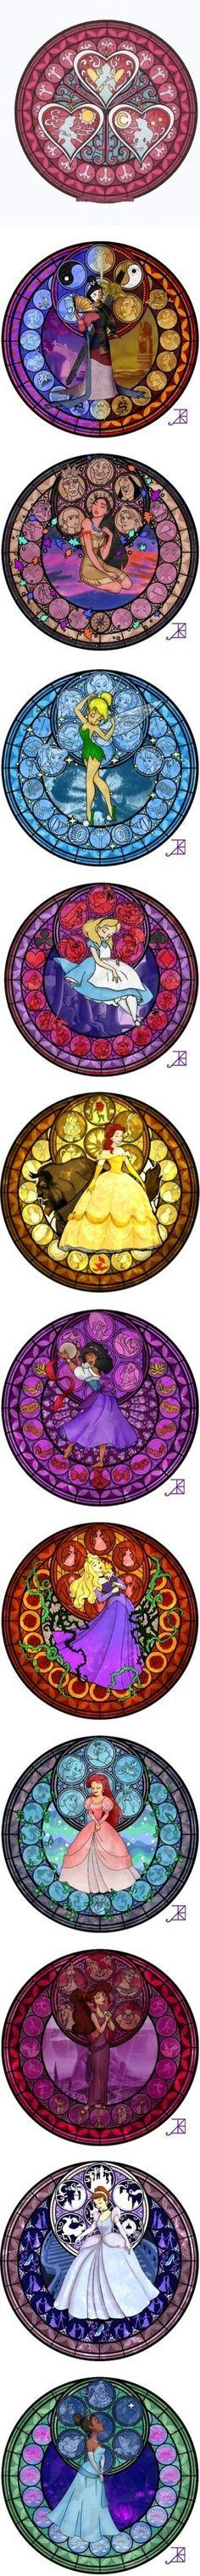 Fairly-like fairytales